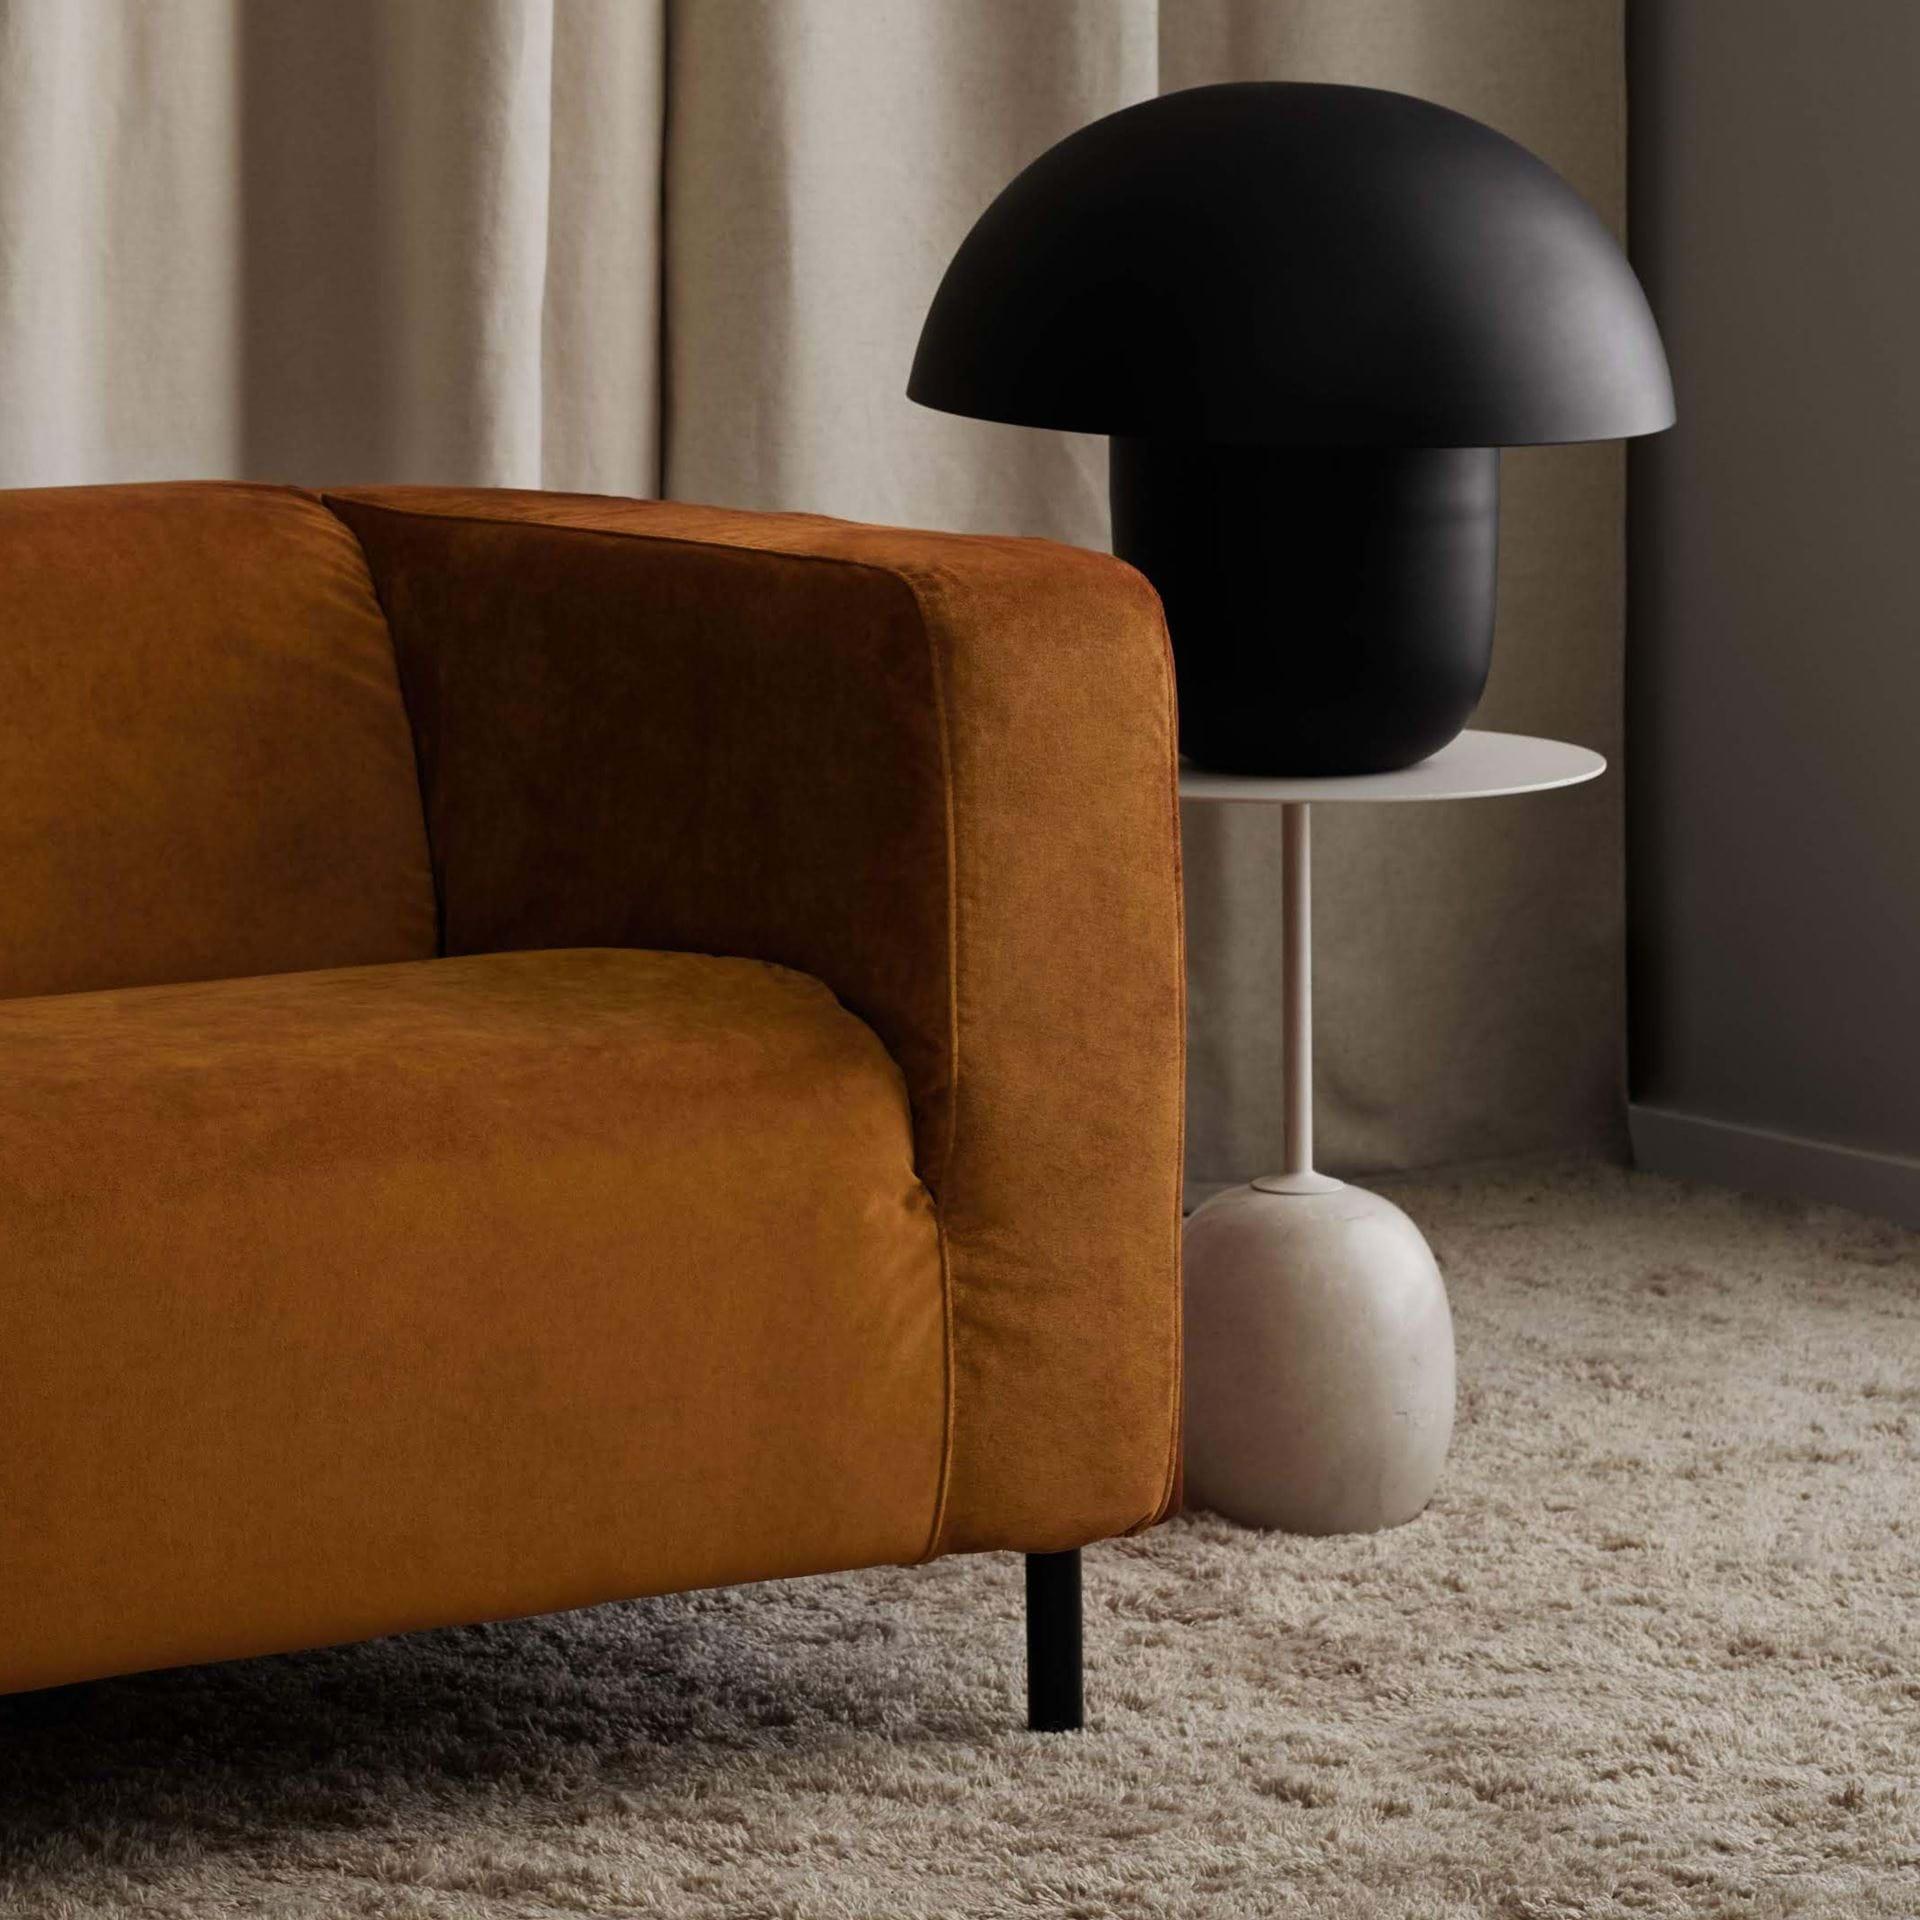 Gambe Per Mobili Ikea sergel gamba sottile in legno per mobili | bemz